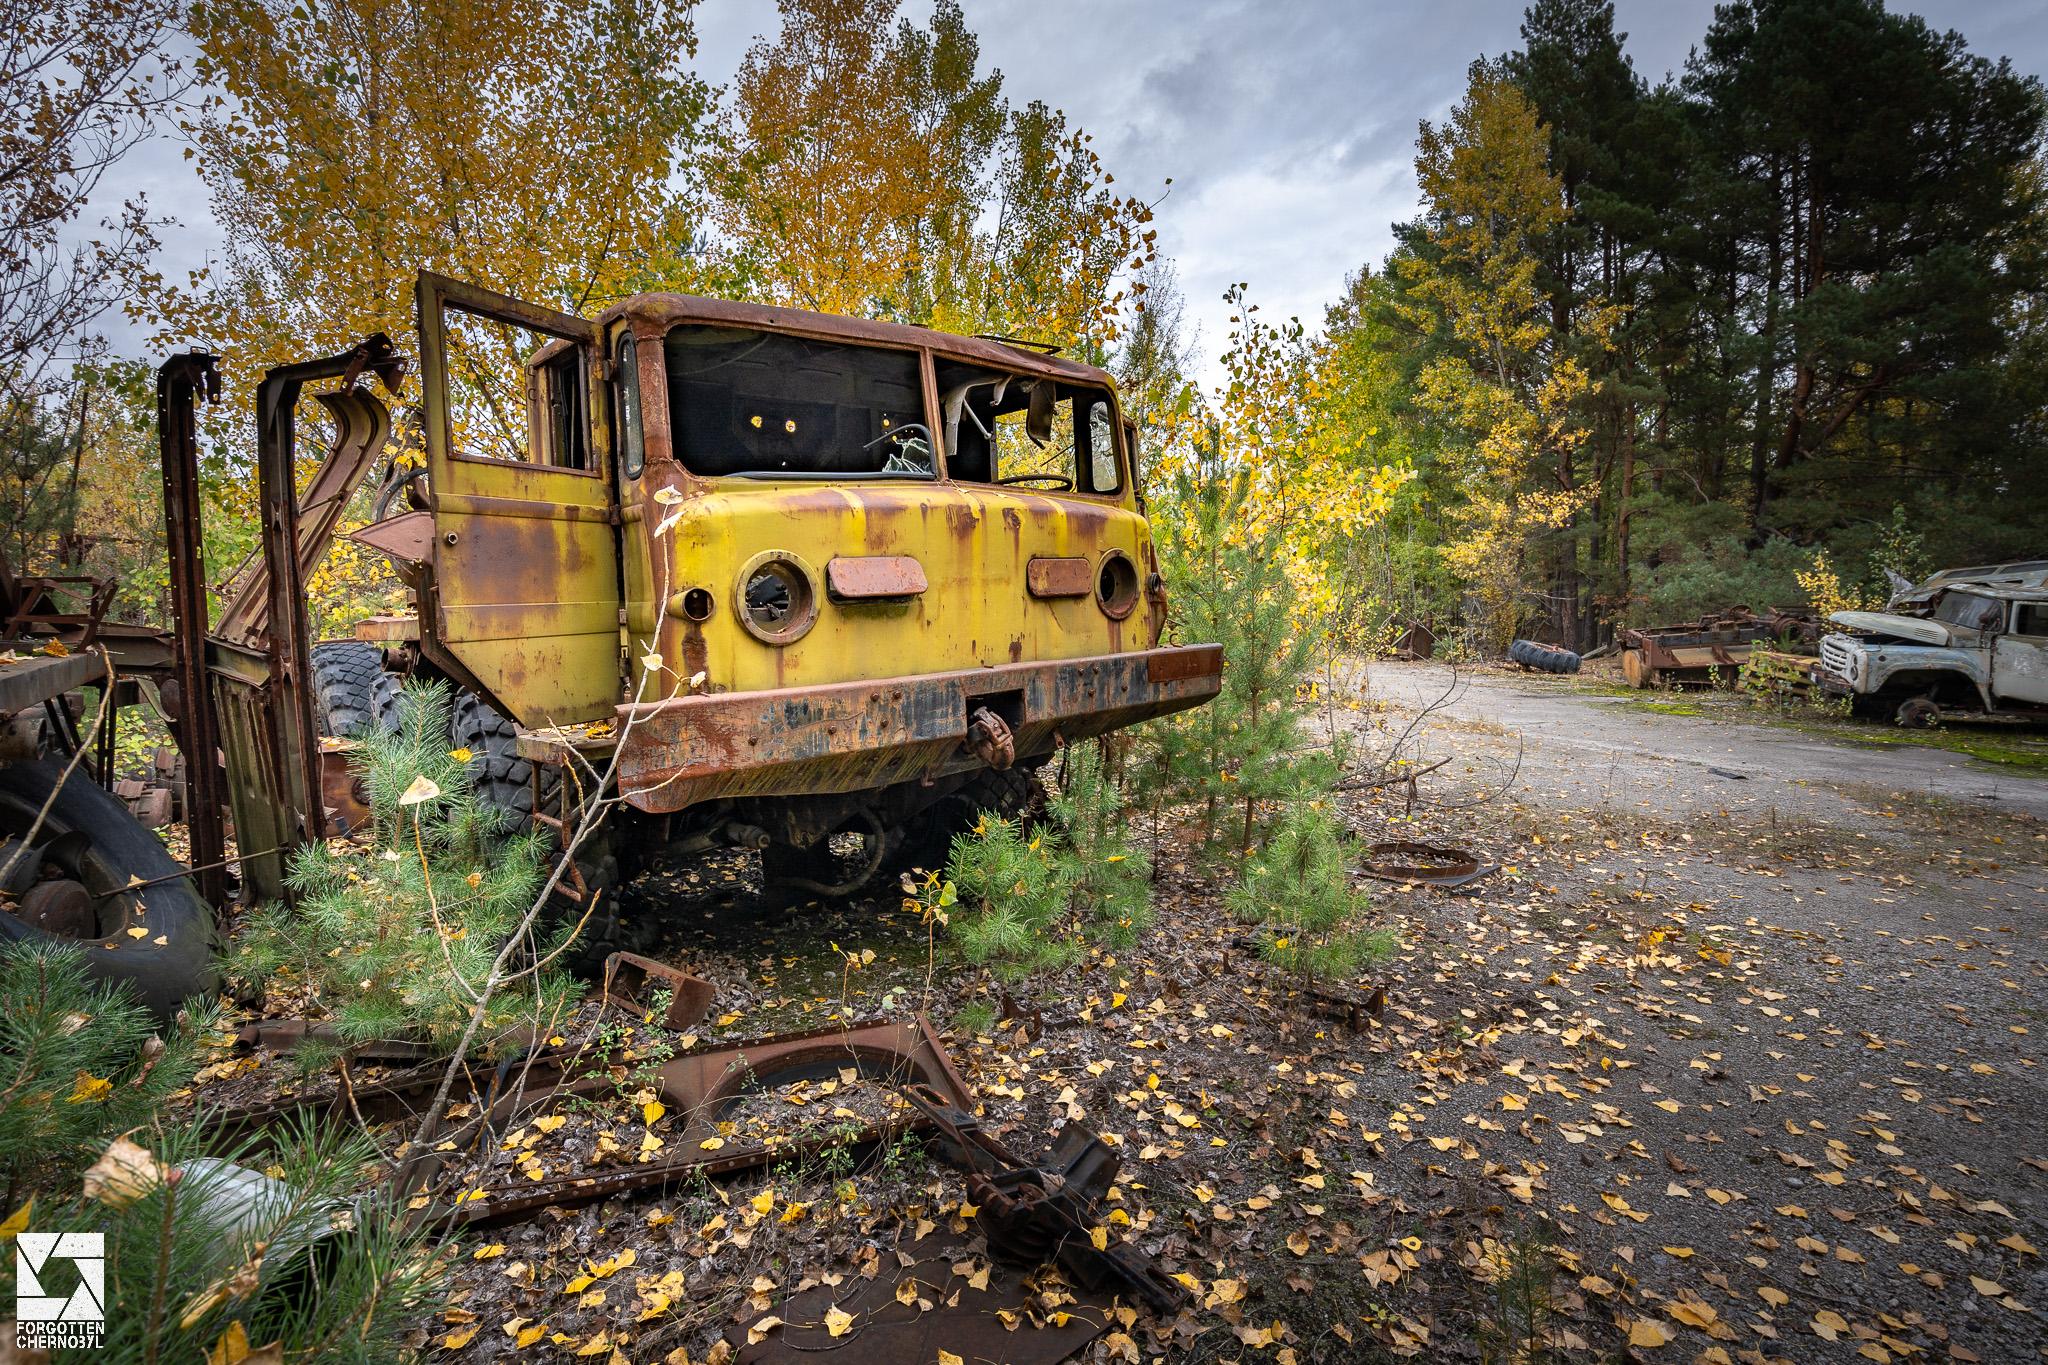 MAZ 537 military truck at the ATH 2 garage and repair facility near Pripyat